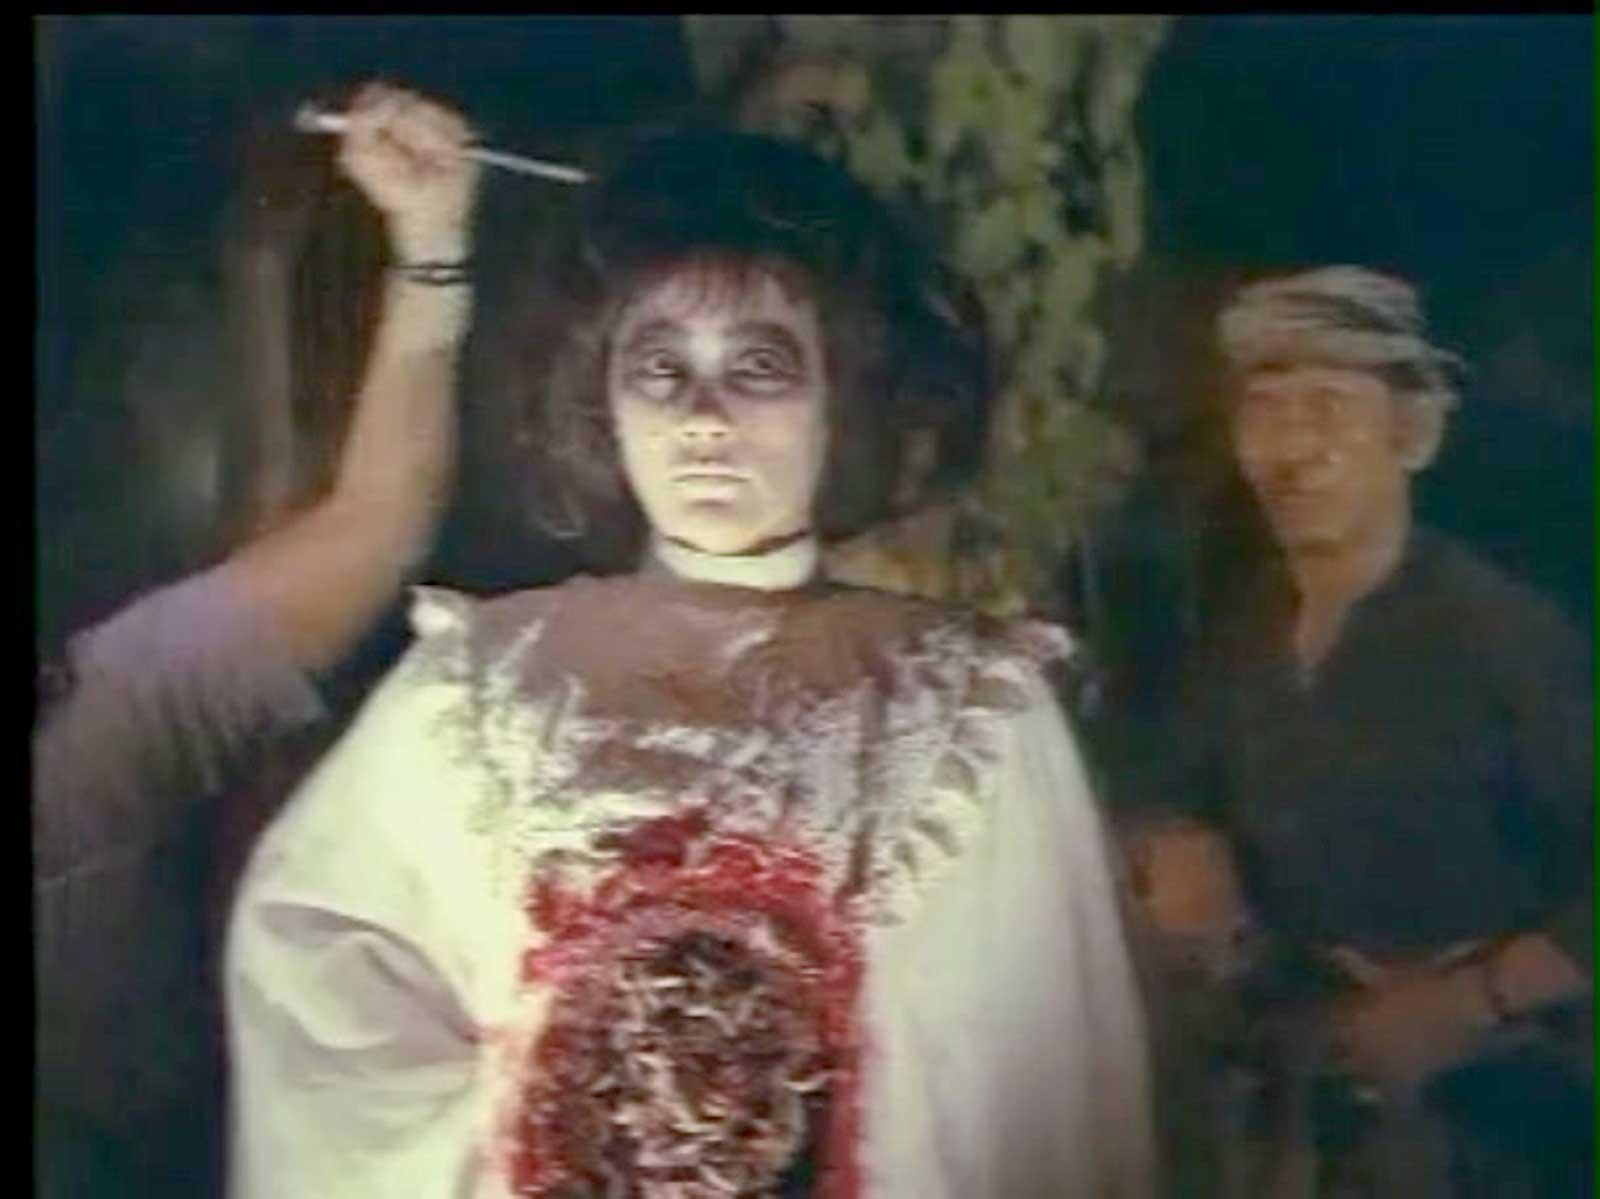 feminine-grotesque-in-indonesian-horror-films_01_